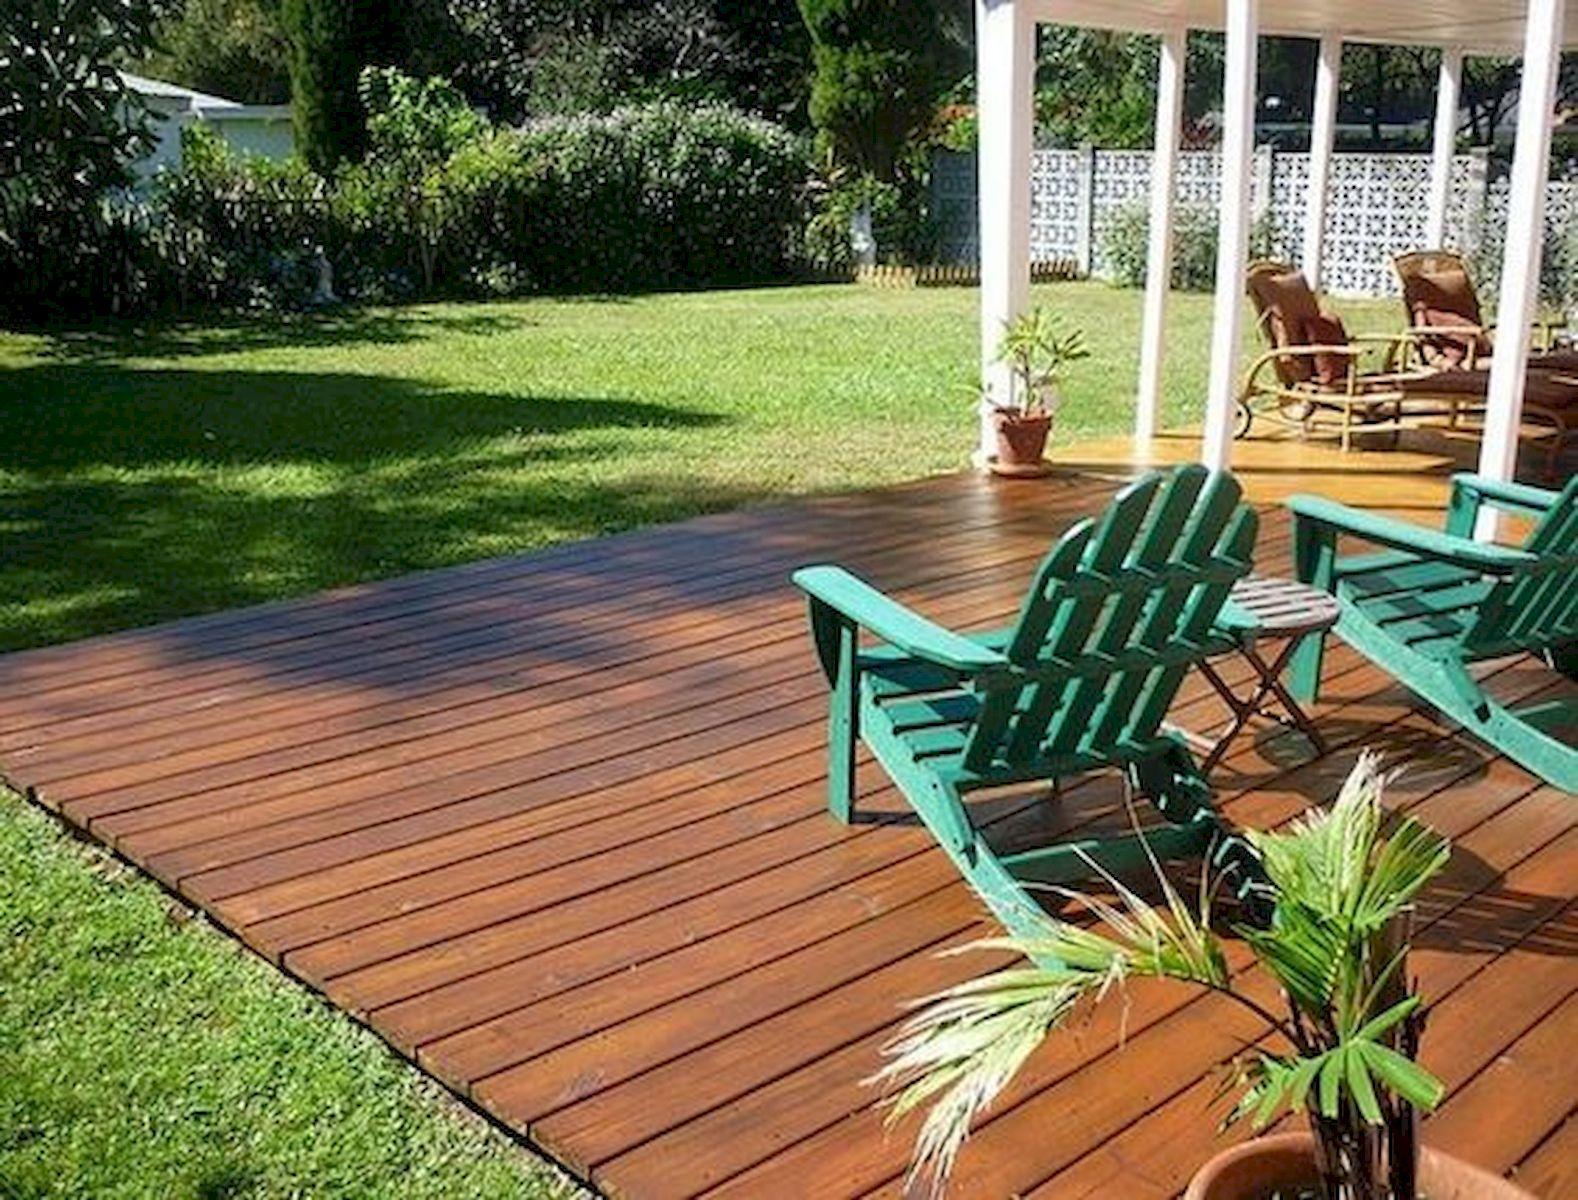 50 Best DIY Backyard Patio And Decking Design Ideas (40)